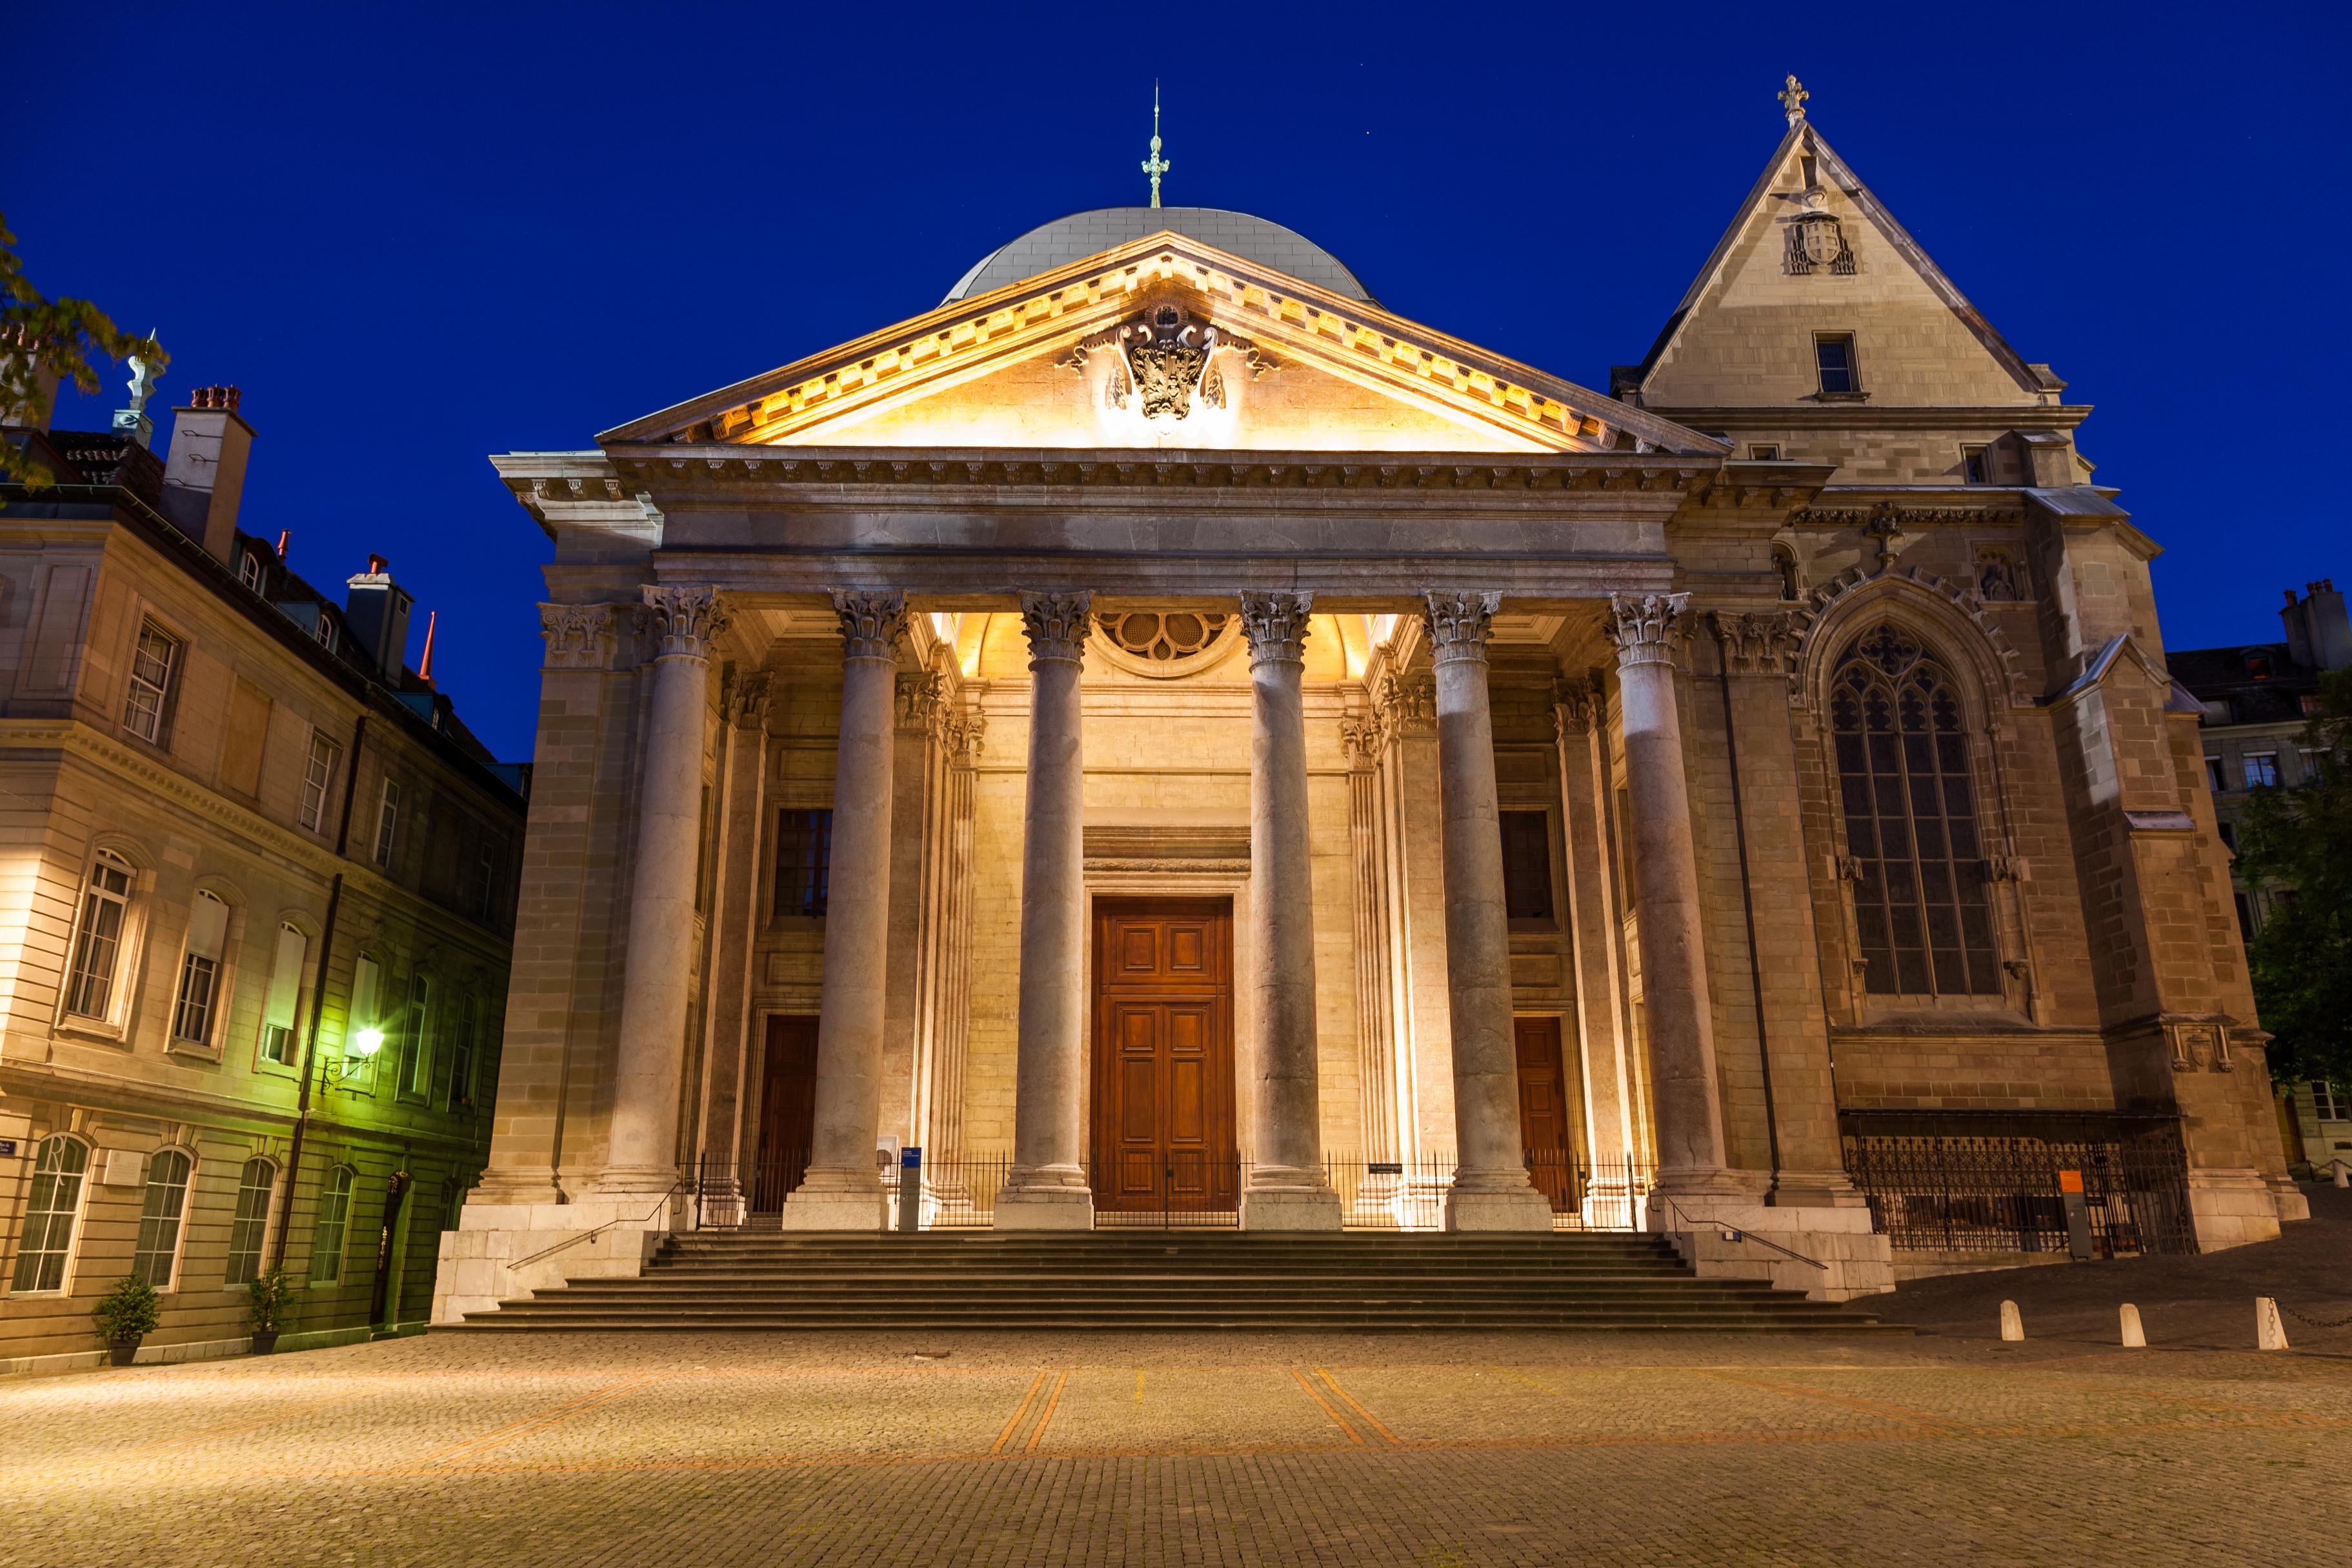 Cathedral-Saint-P'єr